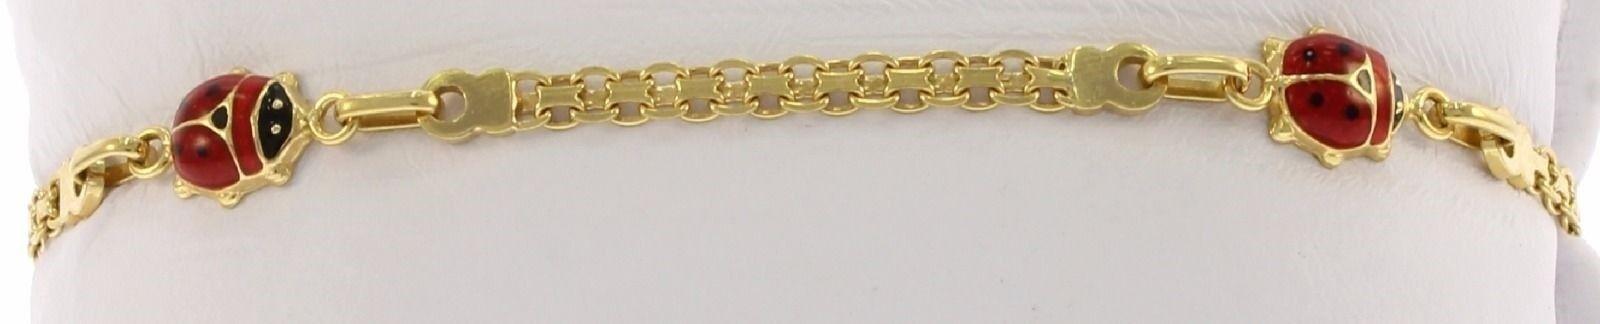 Beautiful Enameled Lady Bug Bracelet in 14 Kt Yellow gold